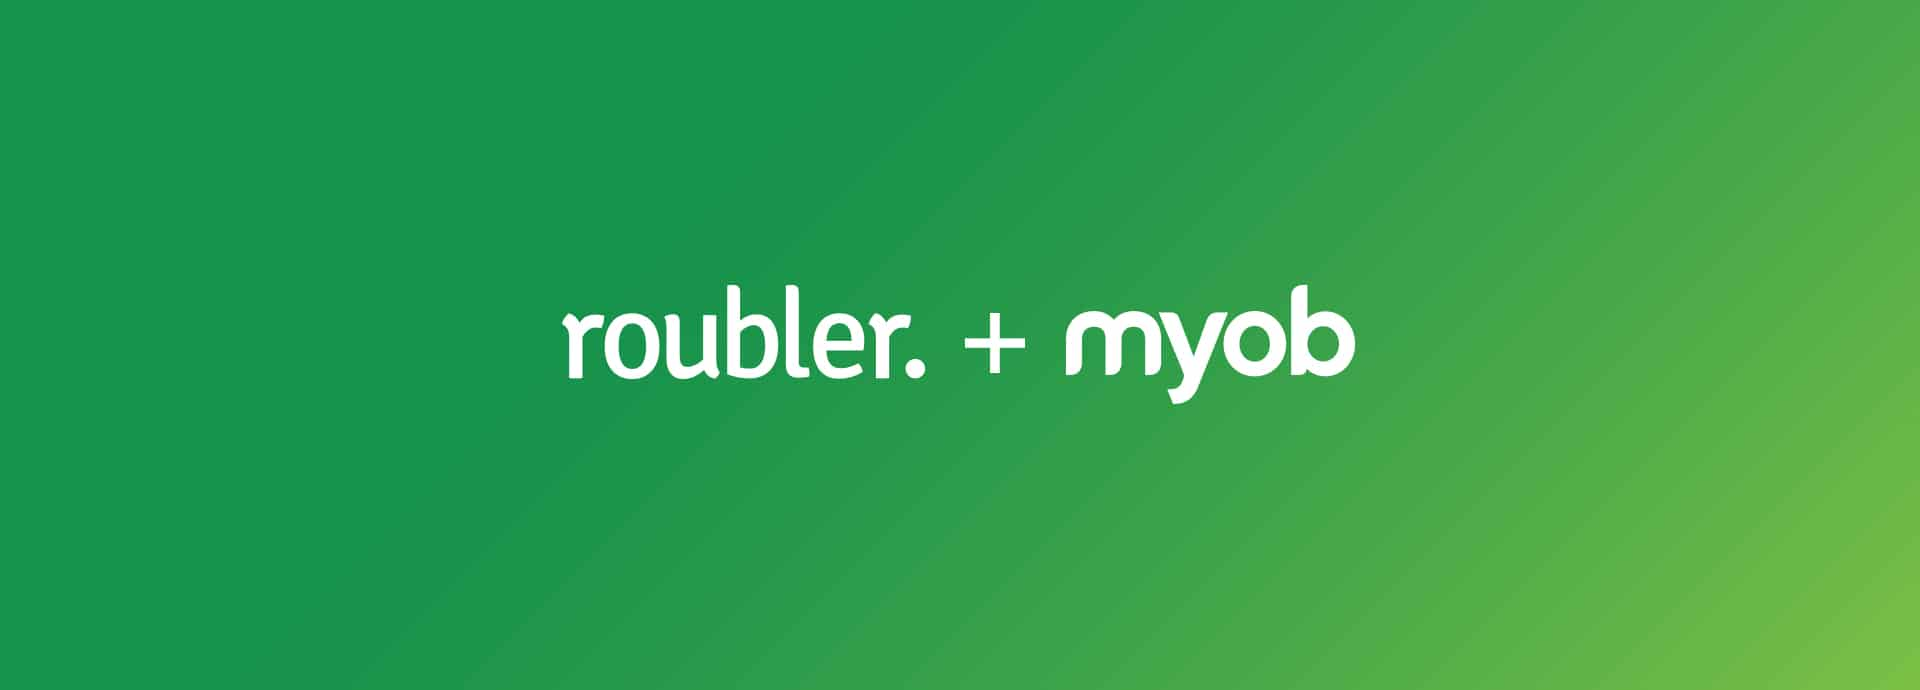 myob partnership announcement